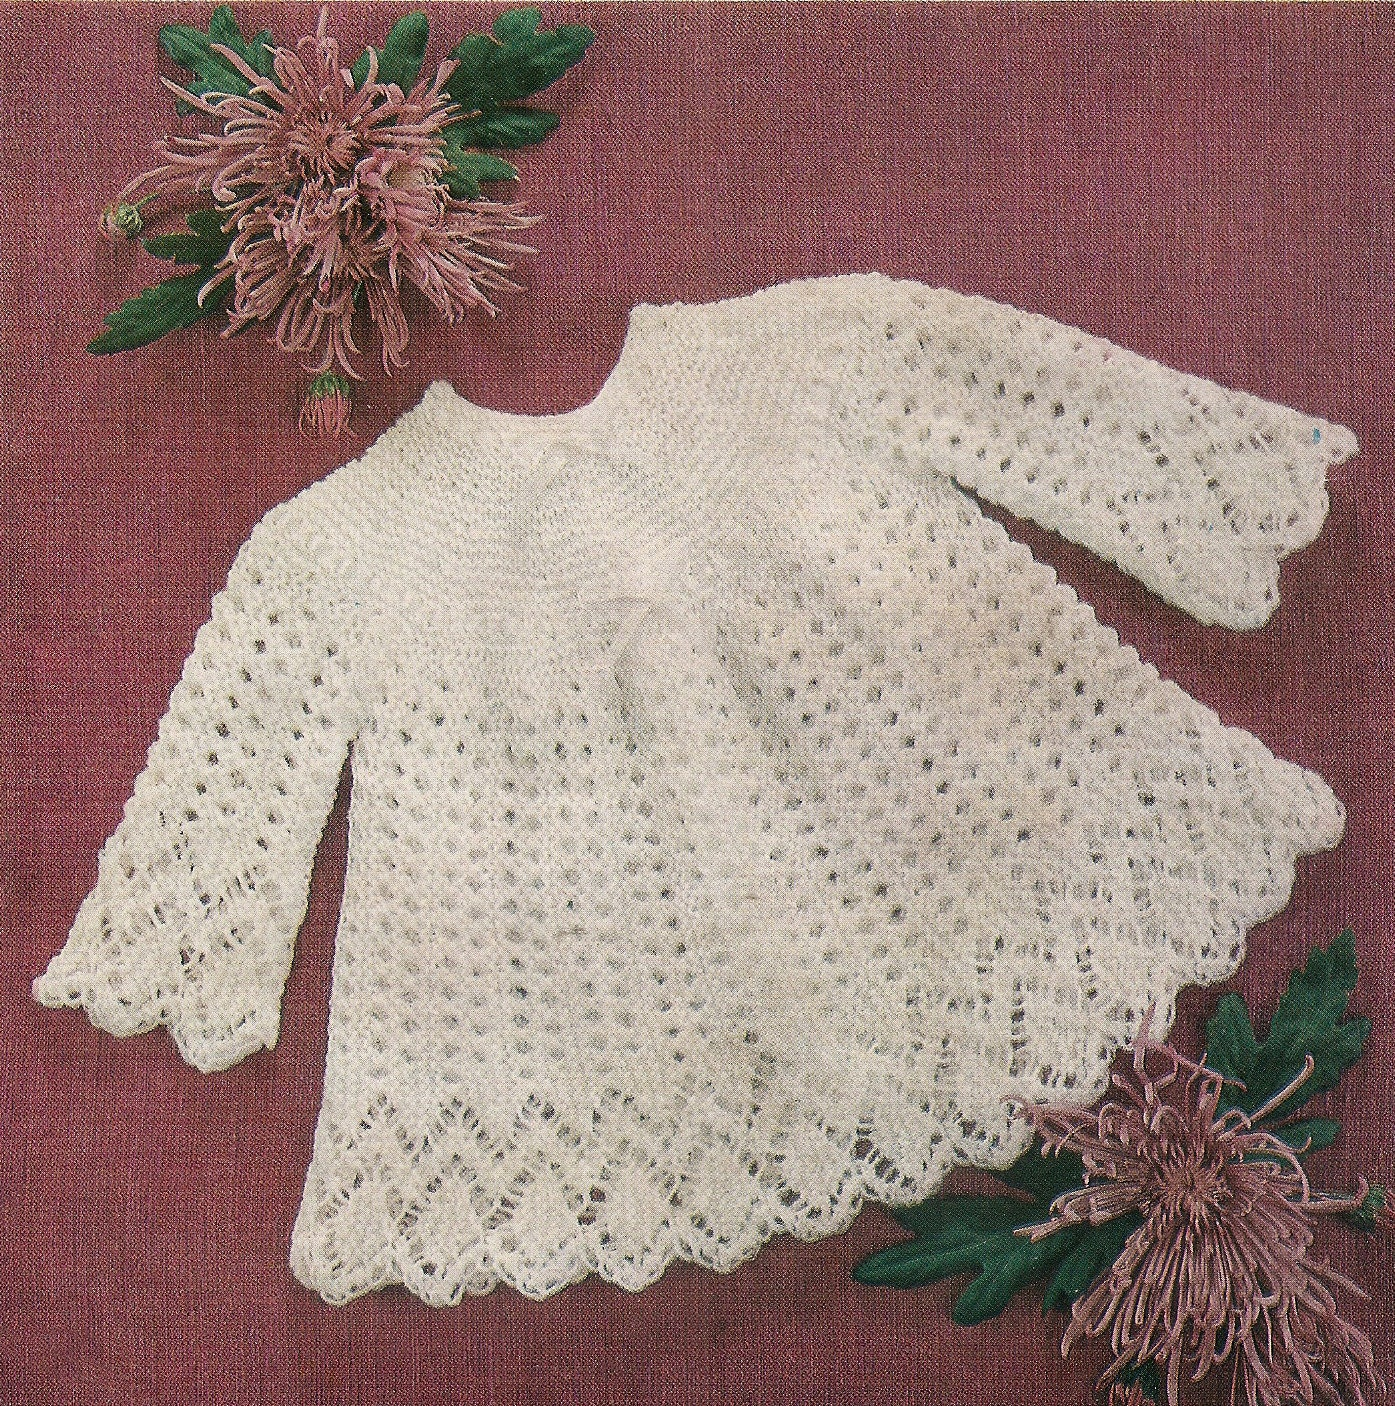 4 Ply Baby Knitting Patterns : Baby Knitting Pattern Angel Top 3 & 4 Ply 46-50 cm Emu 8537